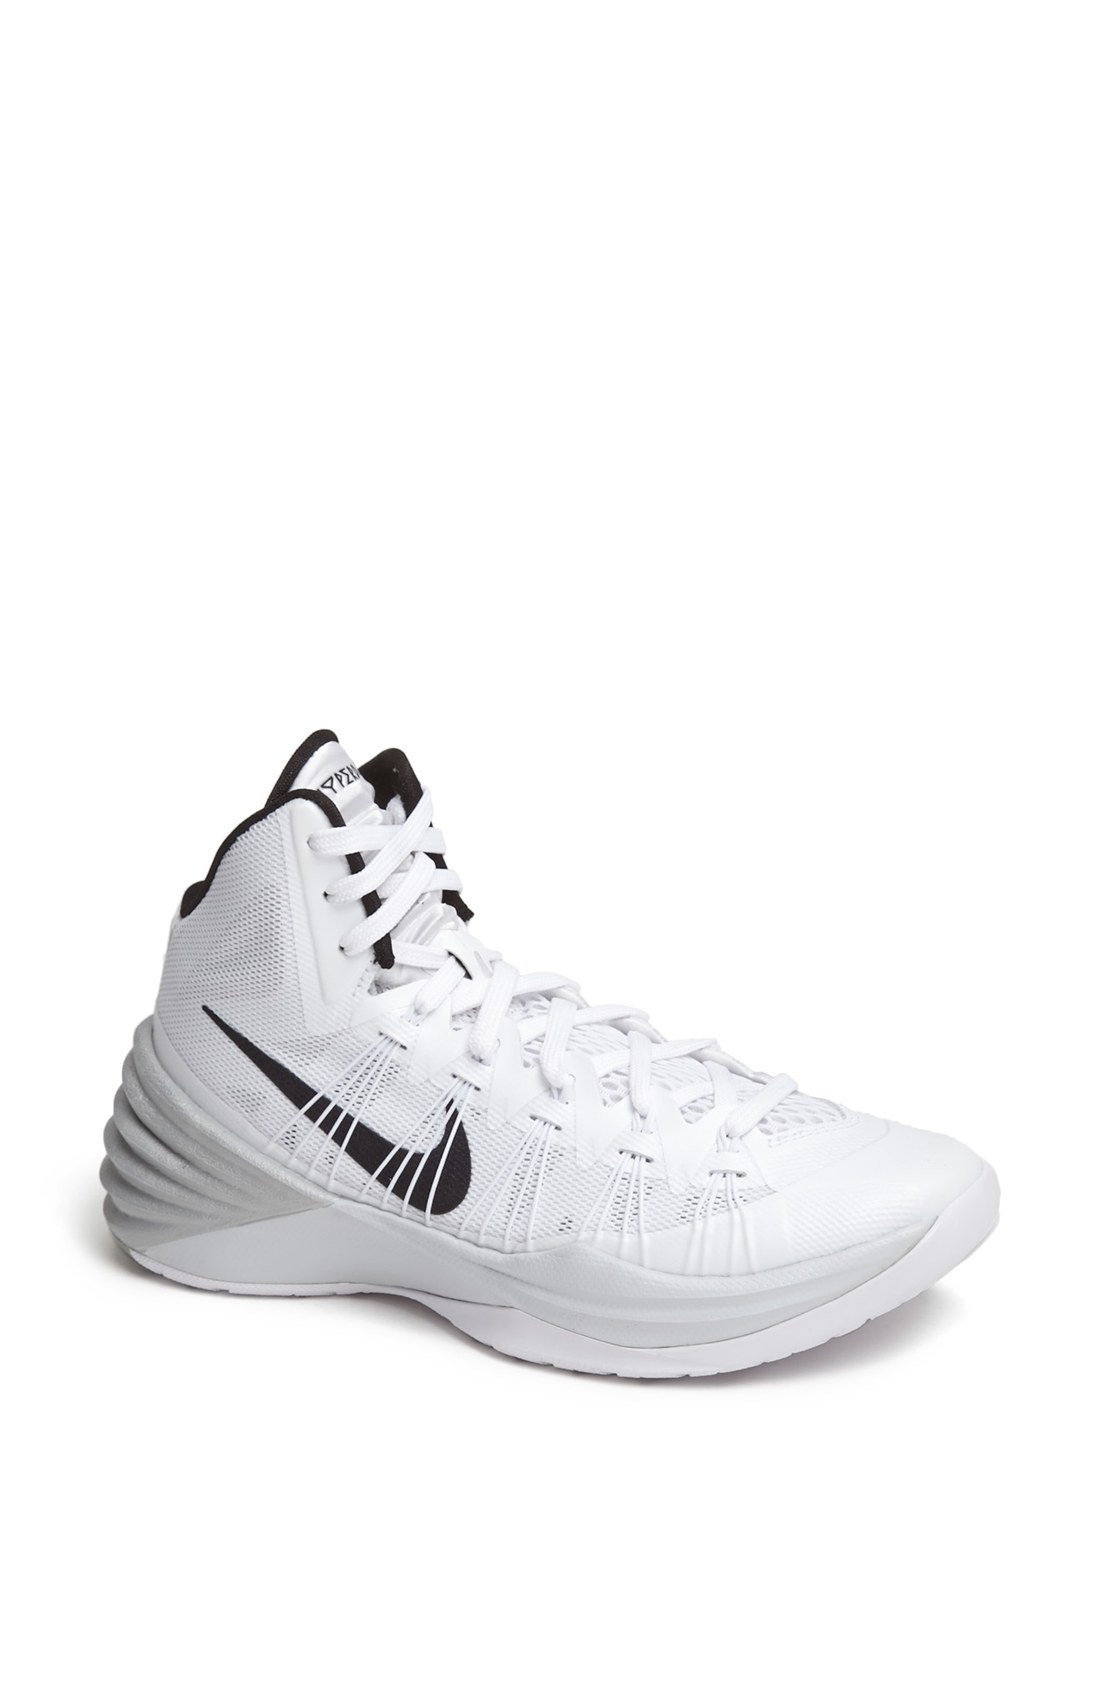 Nike Sneakers | Women's High Tops & Trainers | Lyst  Nike Sneakers |...